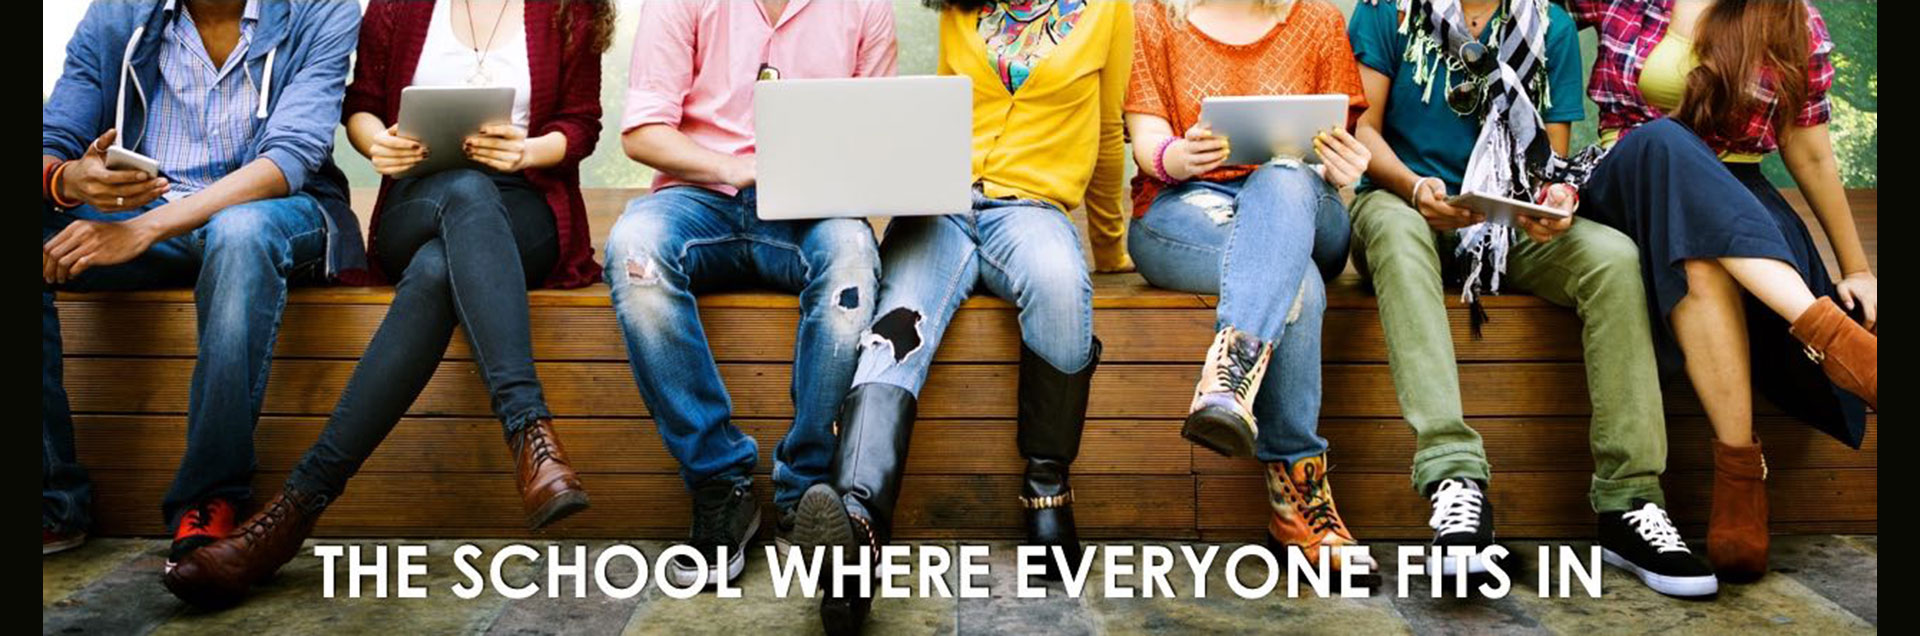 free online high school Arizona